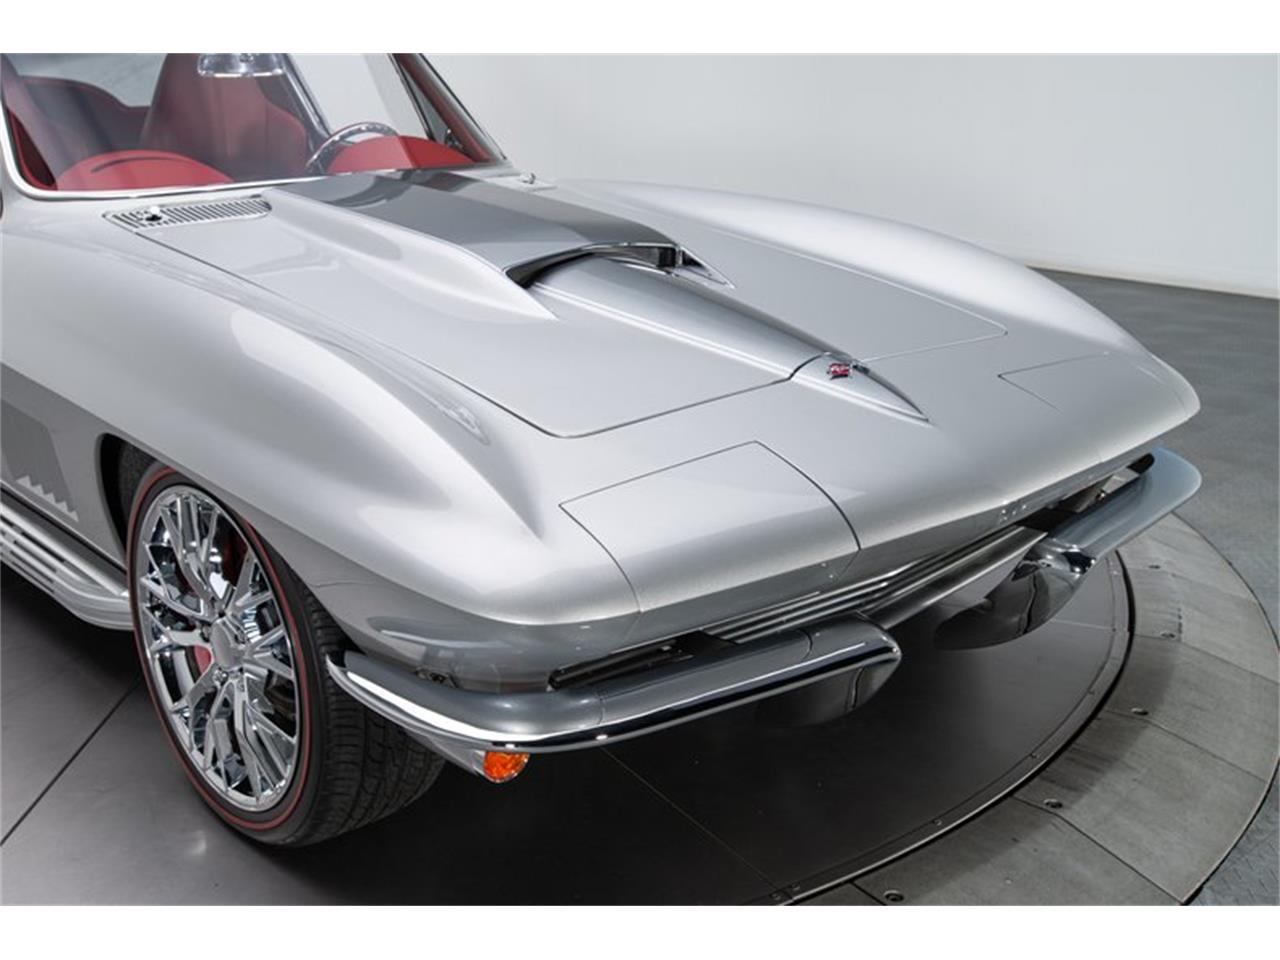 Large Picture of '67 Chevrolet Corvette - $189,900.00 - Q4OM